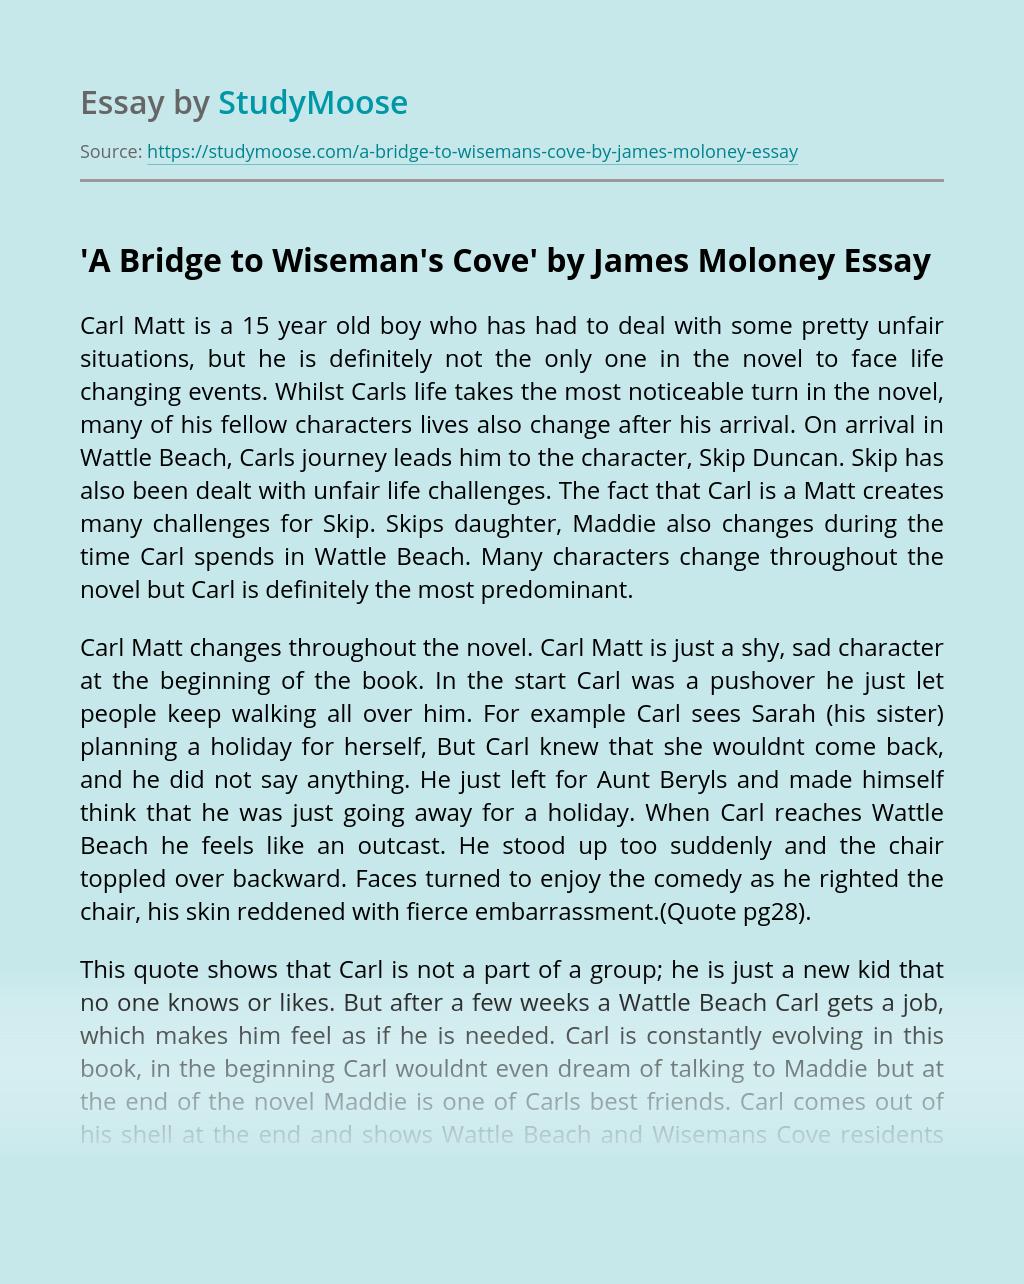 'A Bridge to Wiseman's Cove' by James Moloney